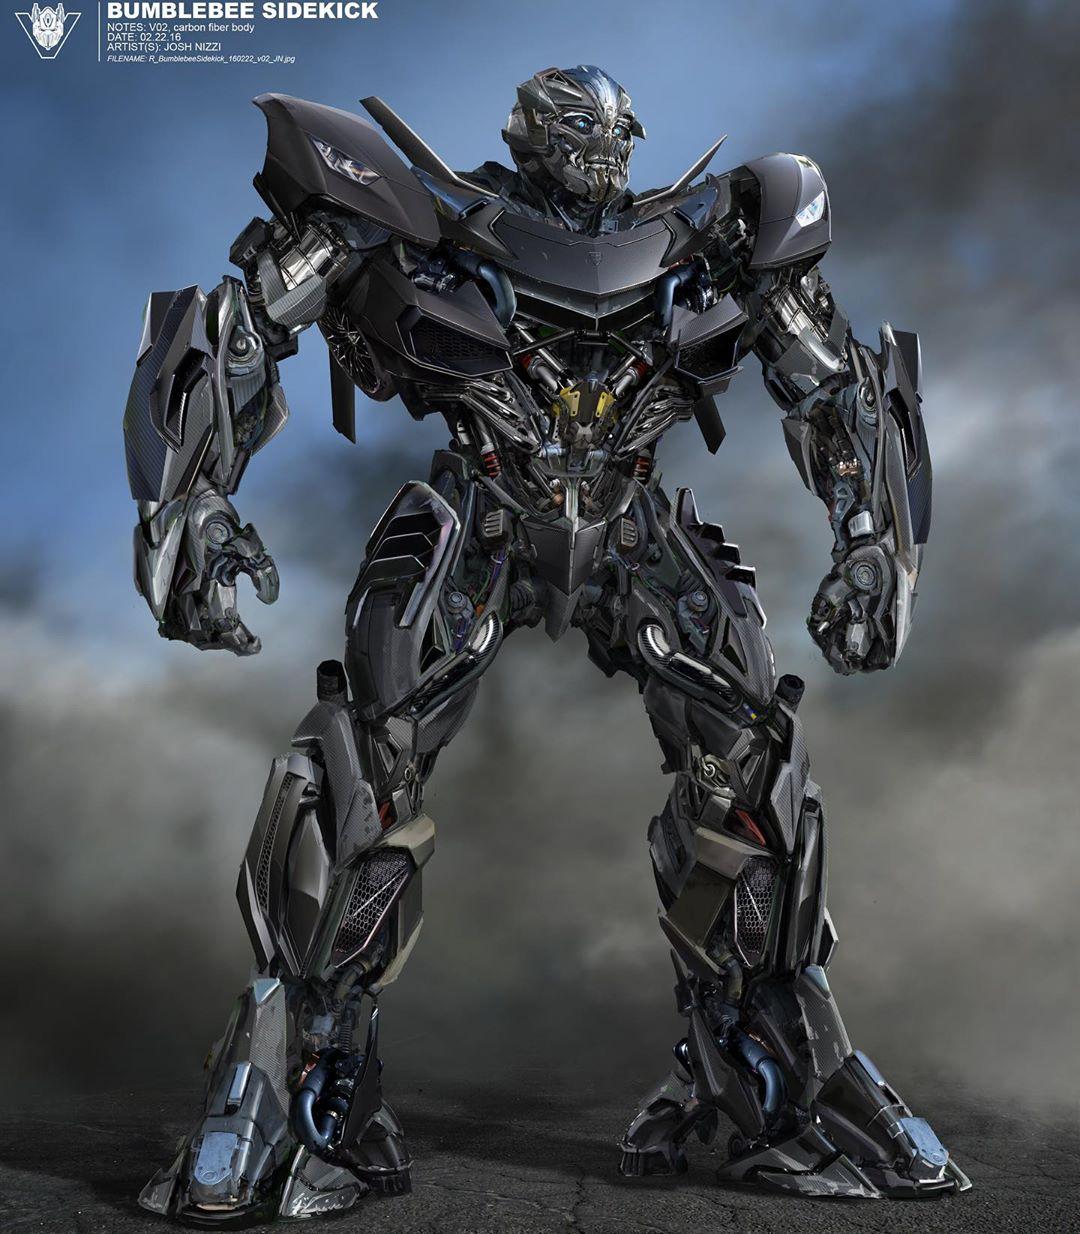 The Last Knight Hot Rod Dark Of The Moon Megatron Concept Art By Josh Nizzi Transformers News Tfw2005